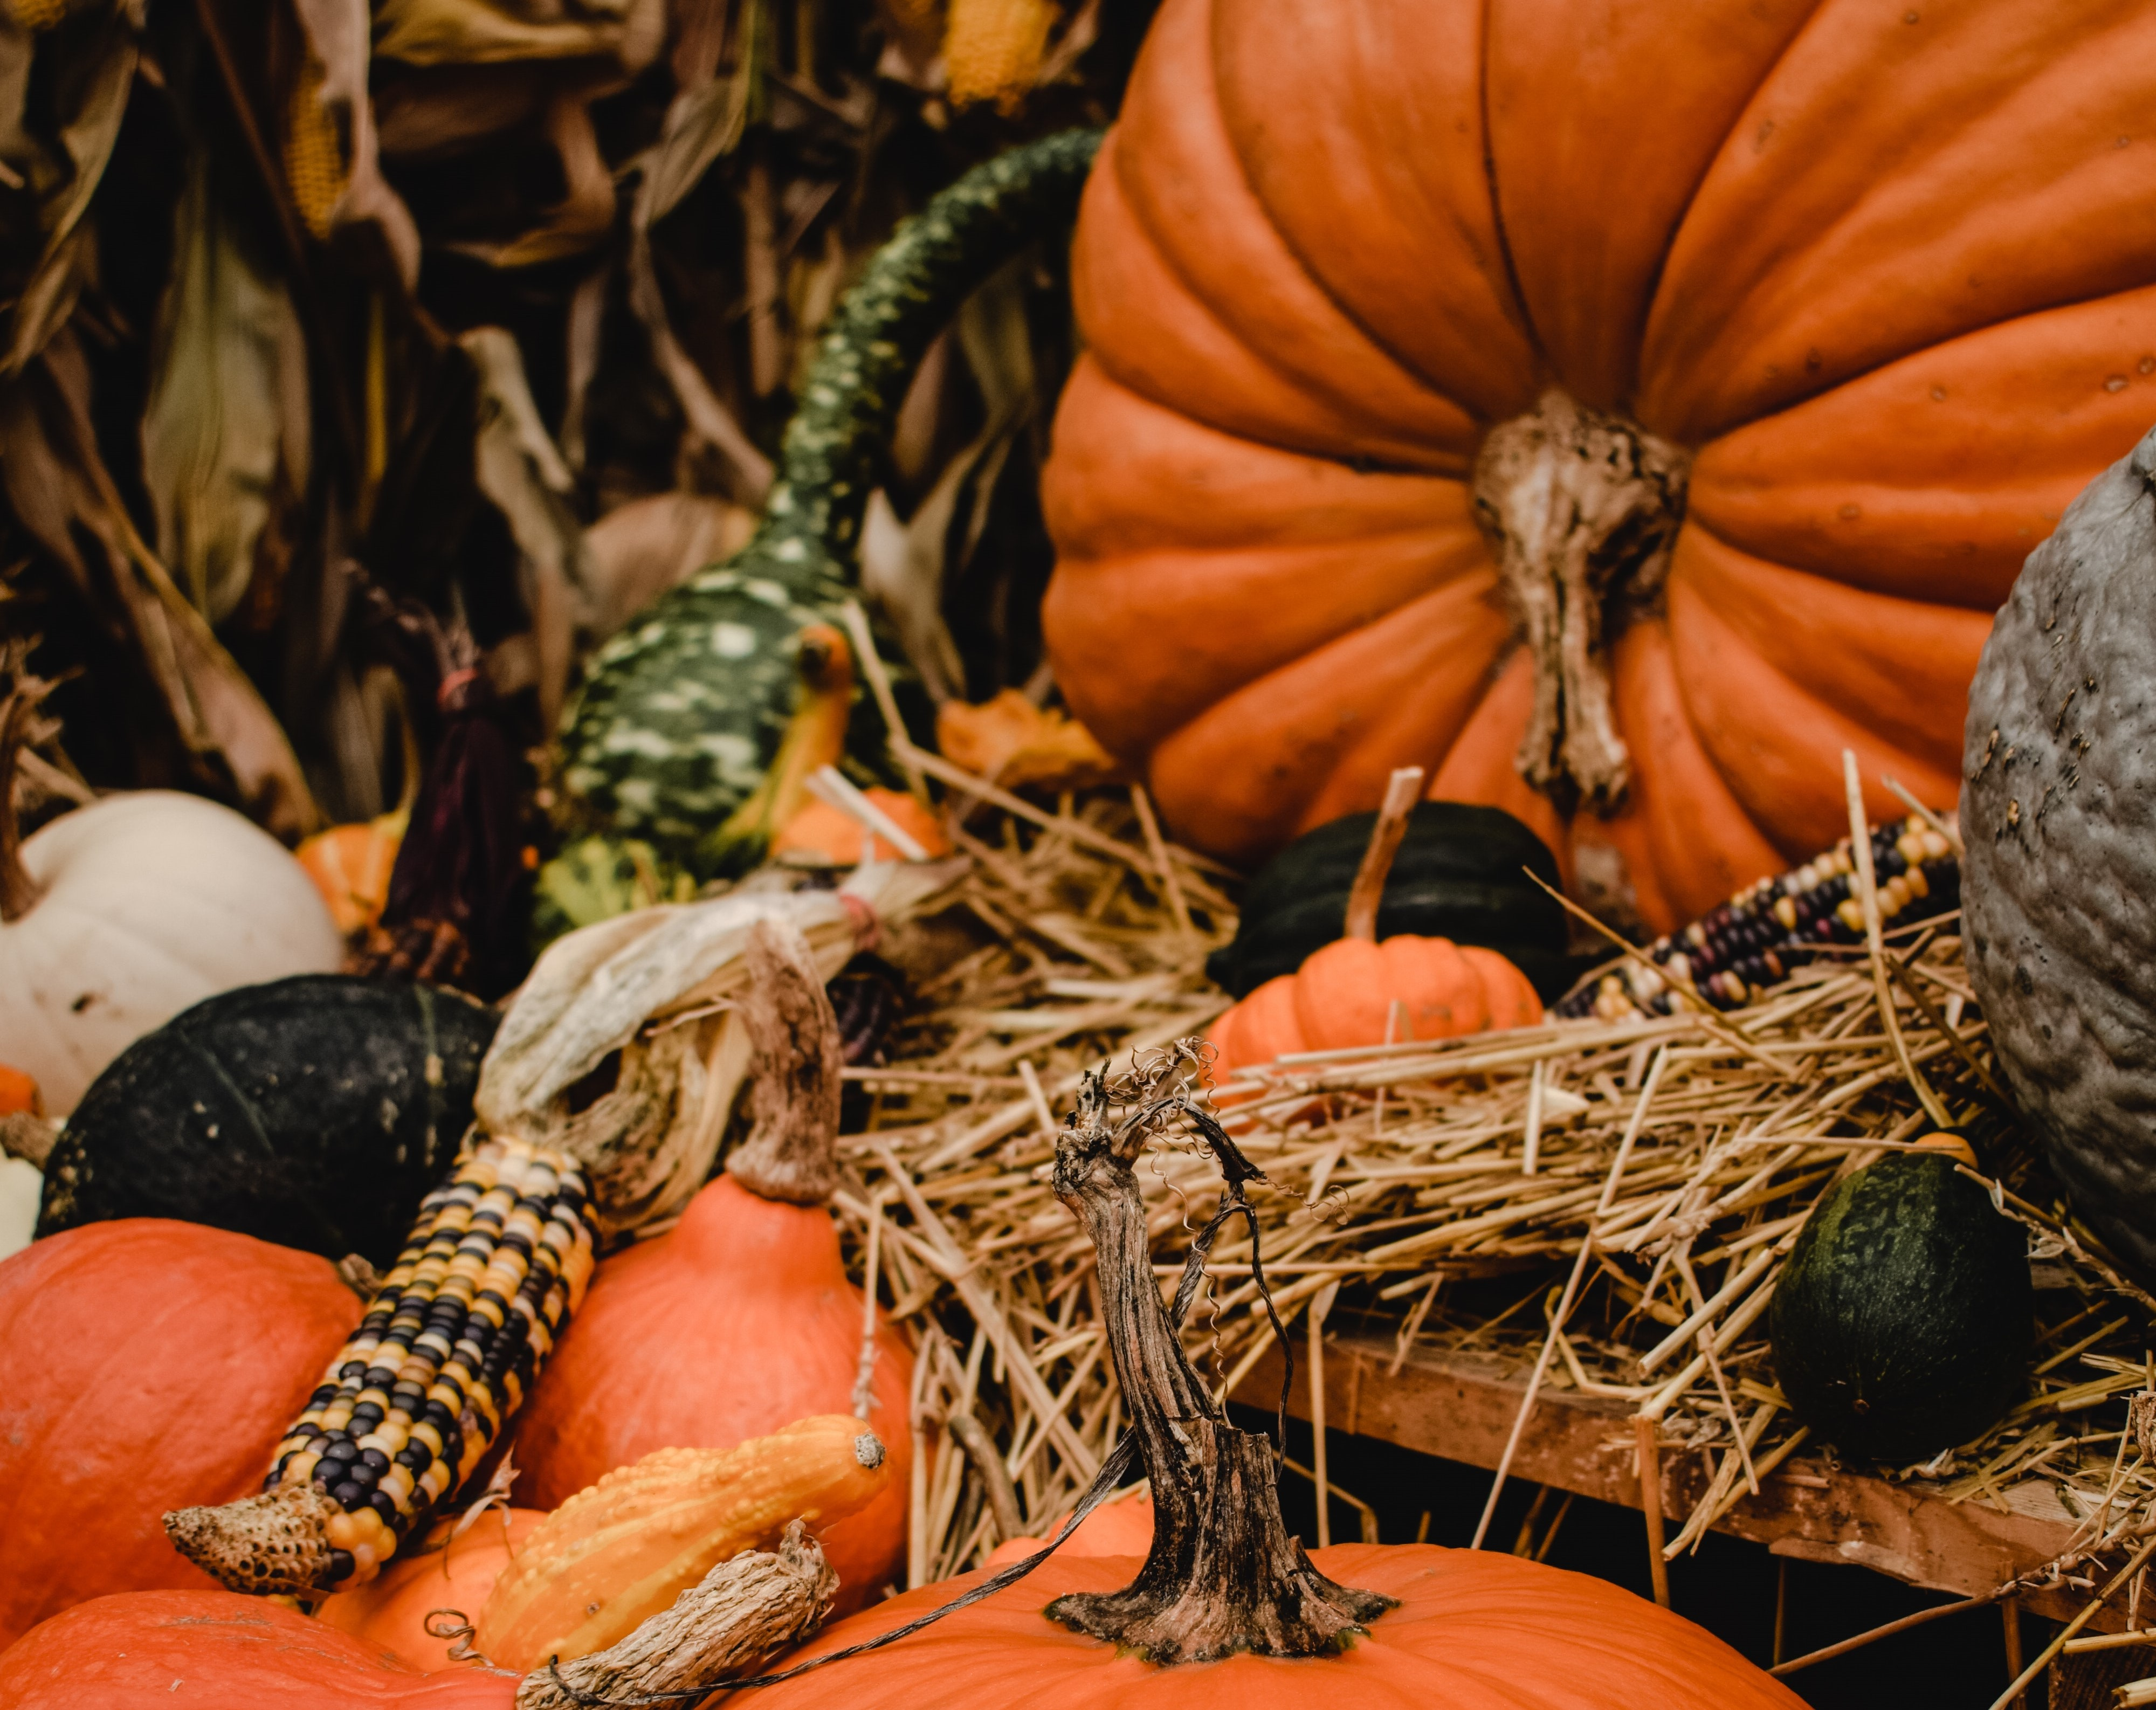 Natural Fall decoration pumpkins corn husks dried leaves